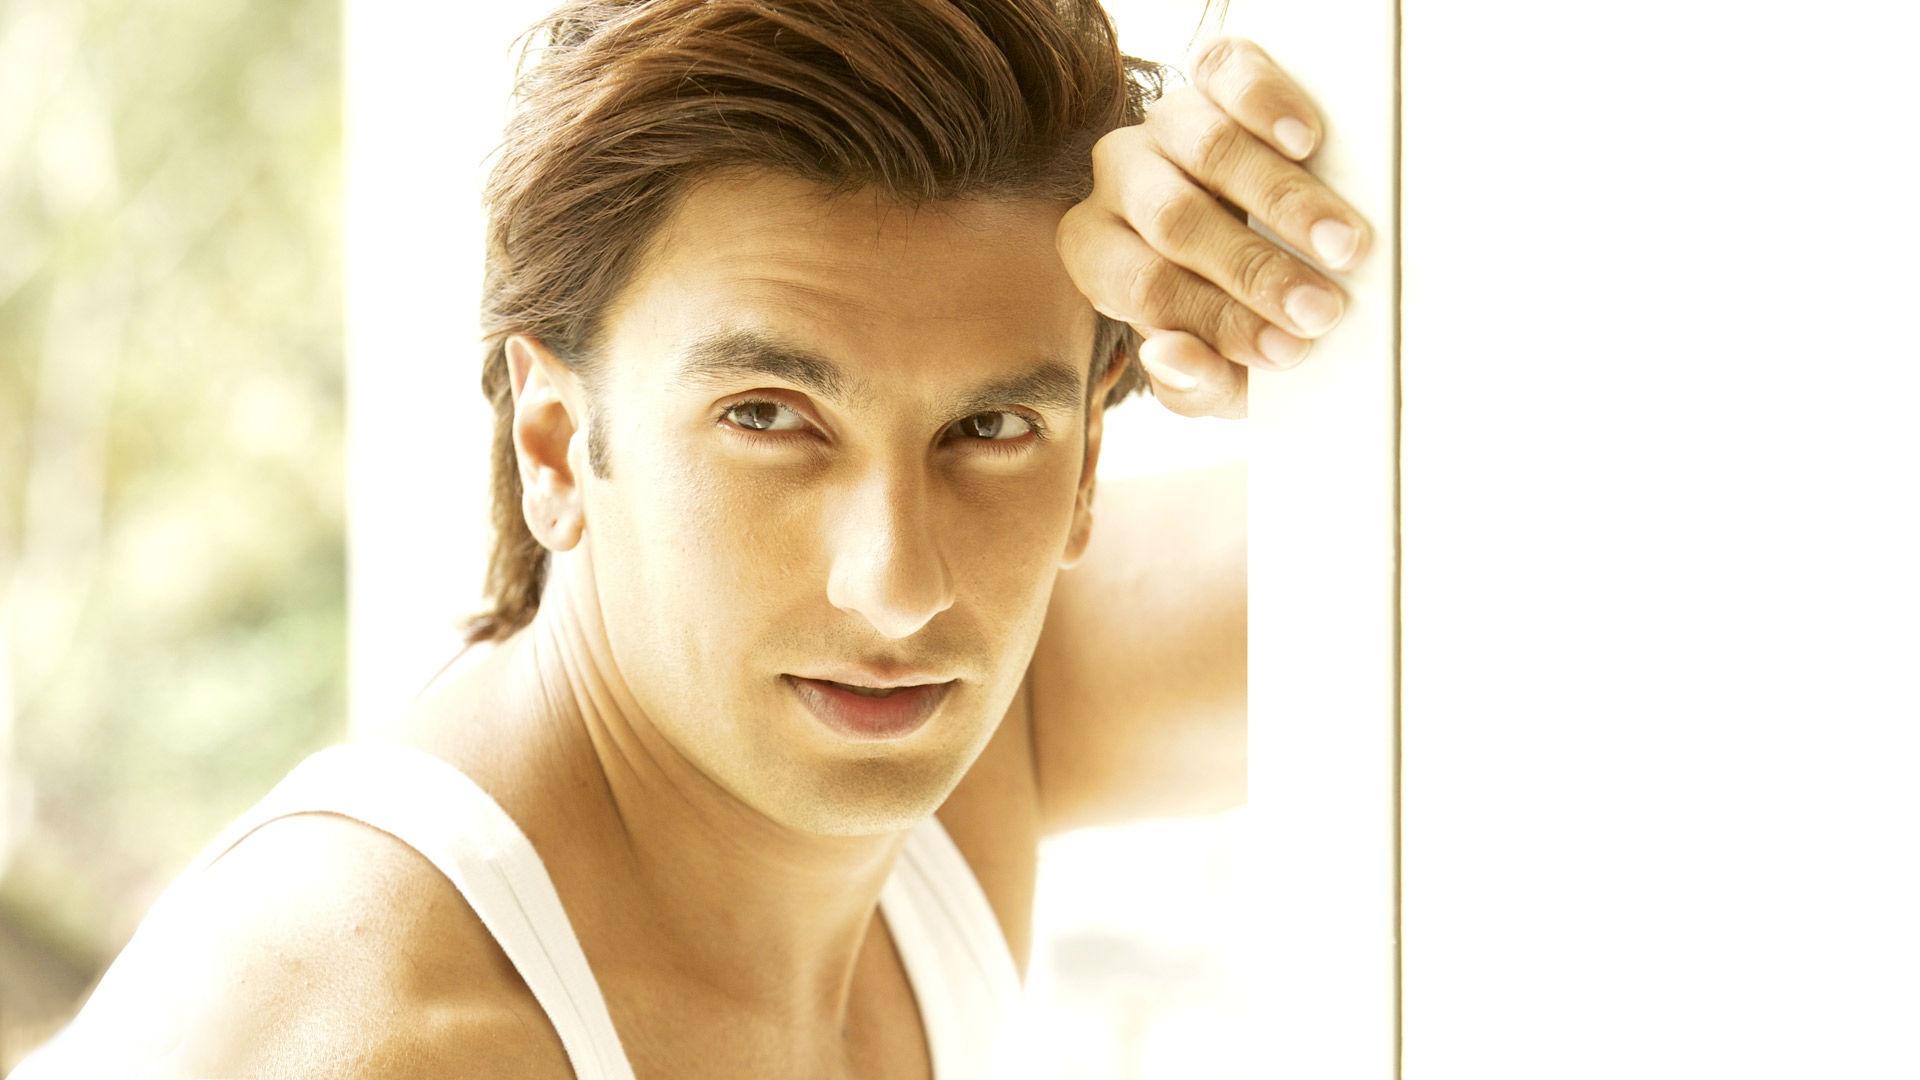 Ranveer Singh Actor Wallpaper 54649 1920x1080px